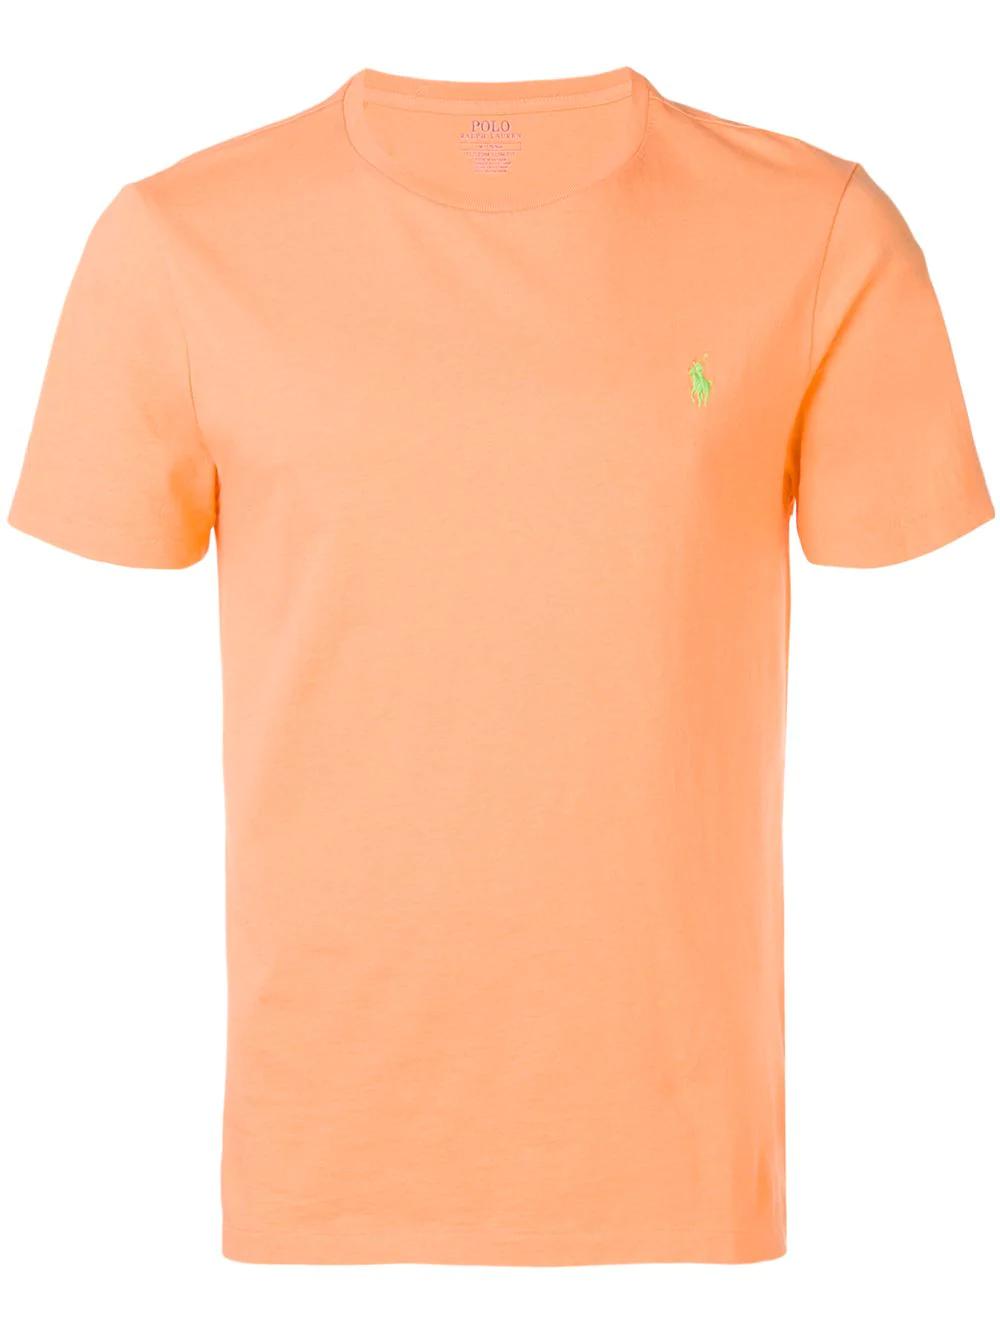 2d3e15af563 Polo Ralph Lauren Logo Embroidered T-Shirt - Orange